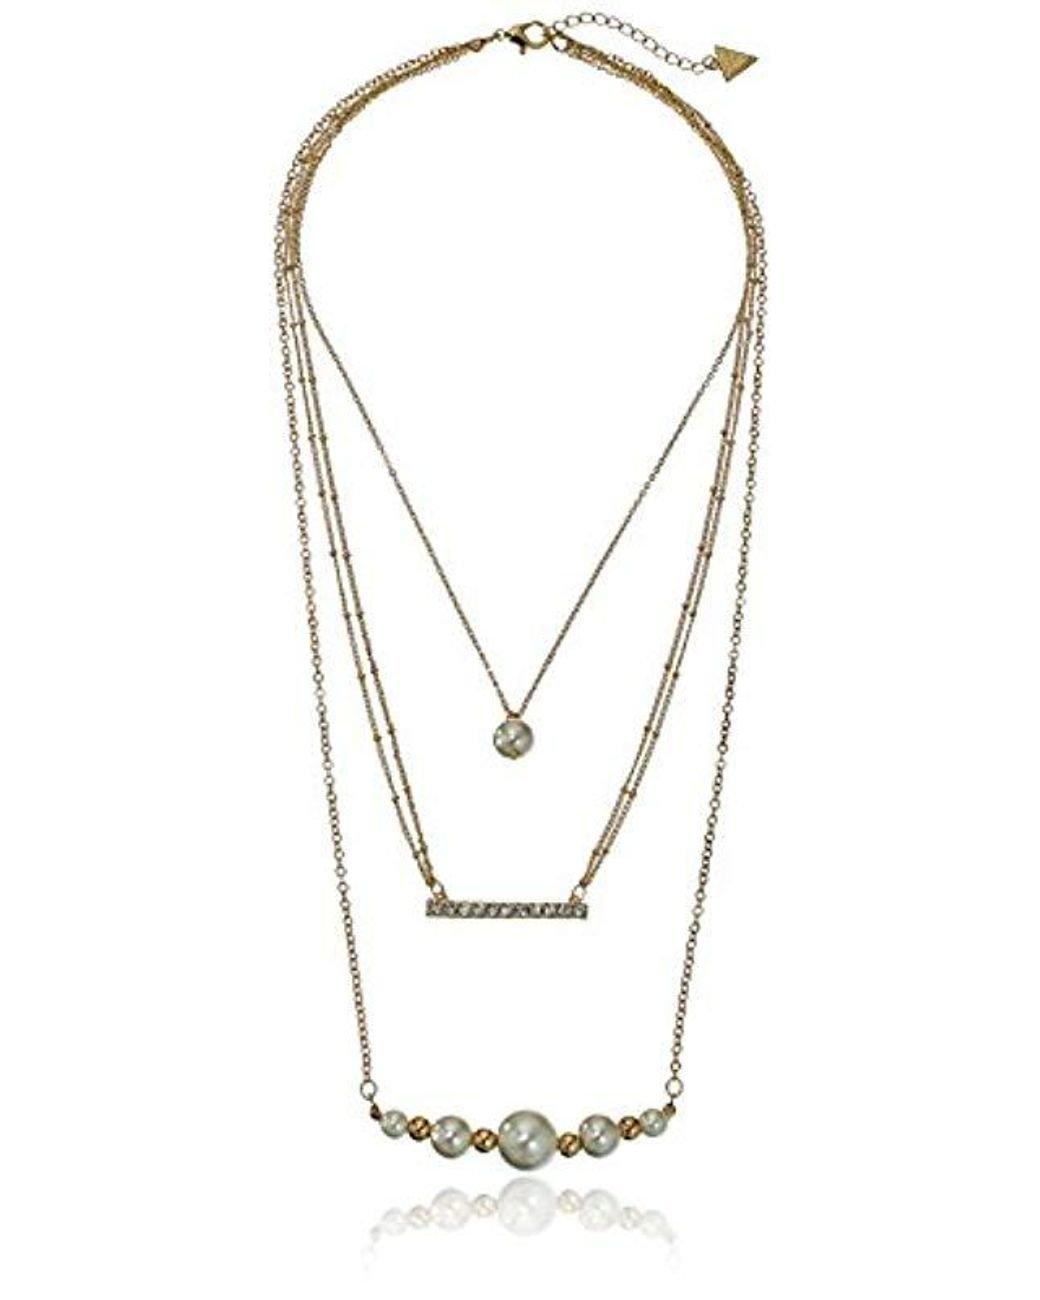 a691bb8b0e958 Women's Metallic 3 Row Pearl Chain Necklace